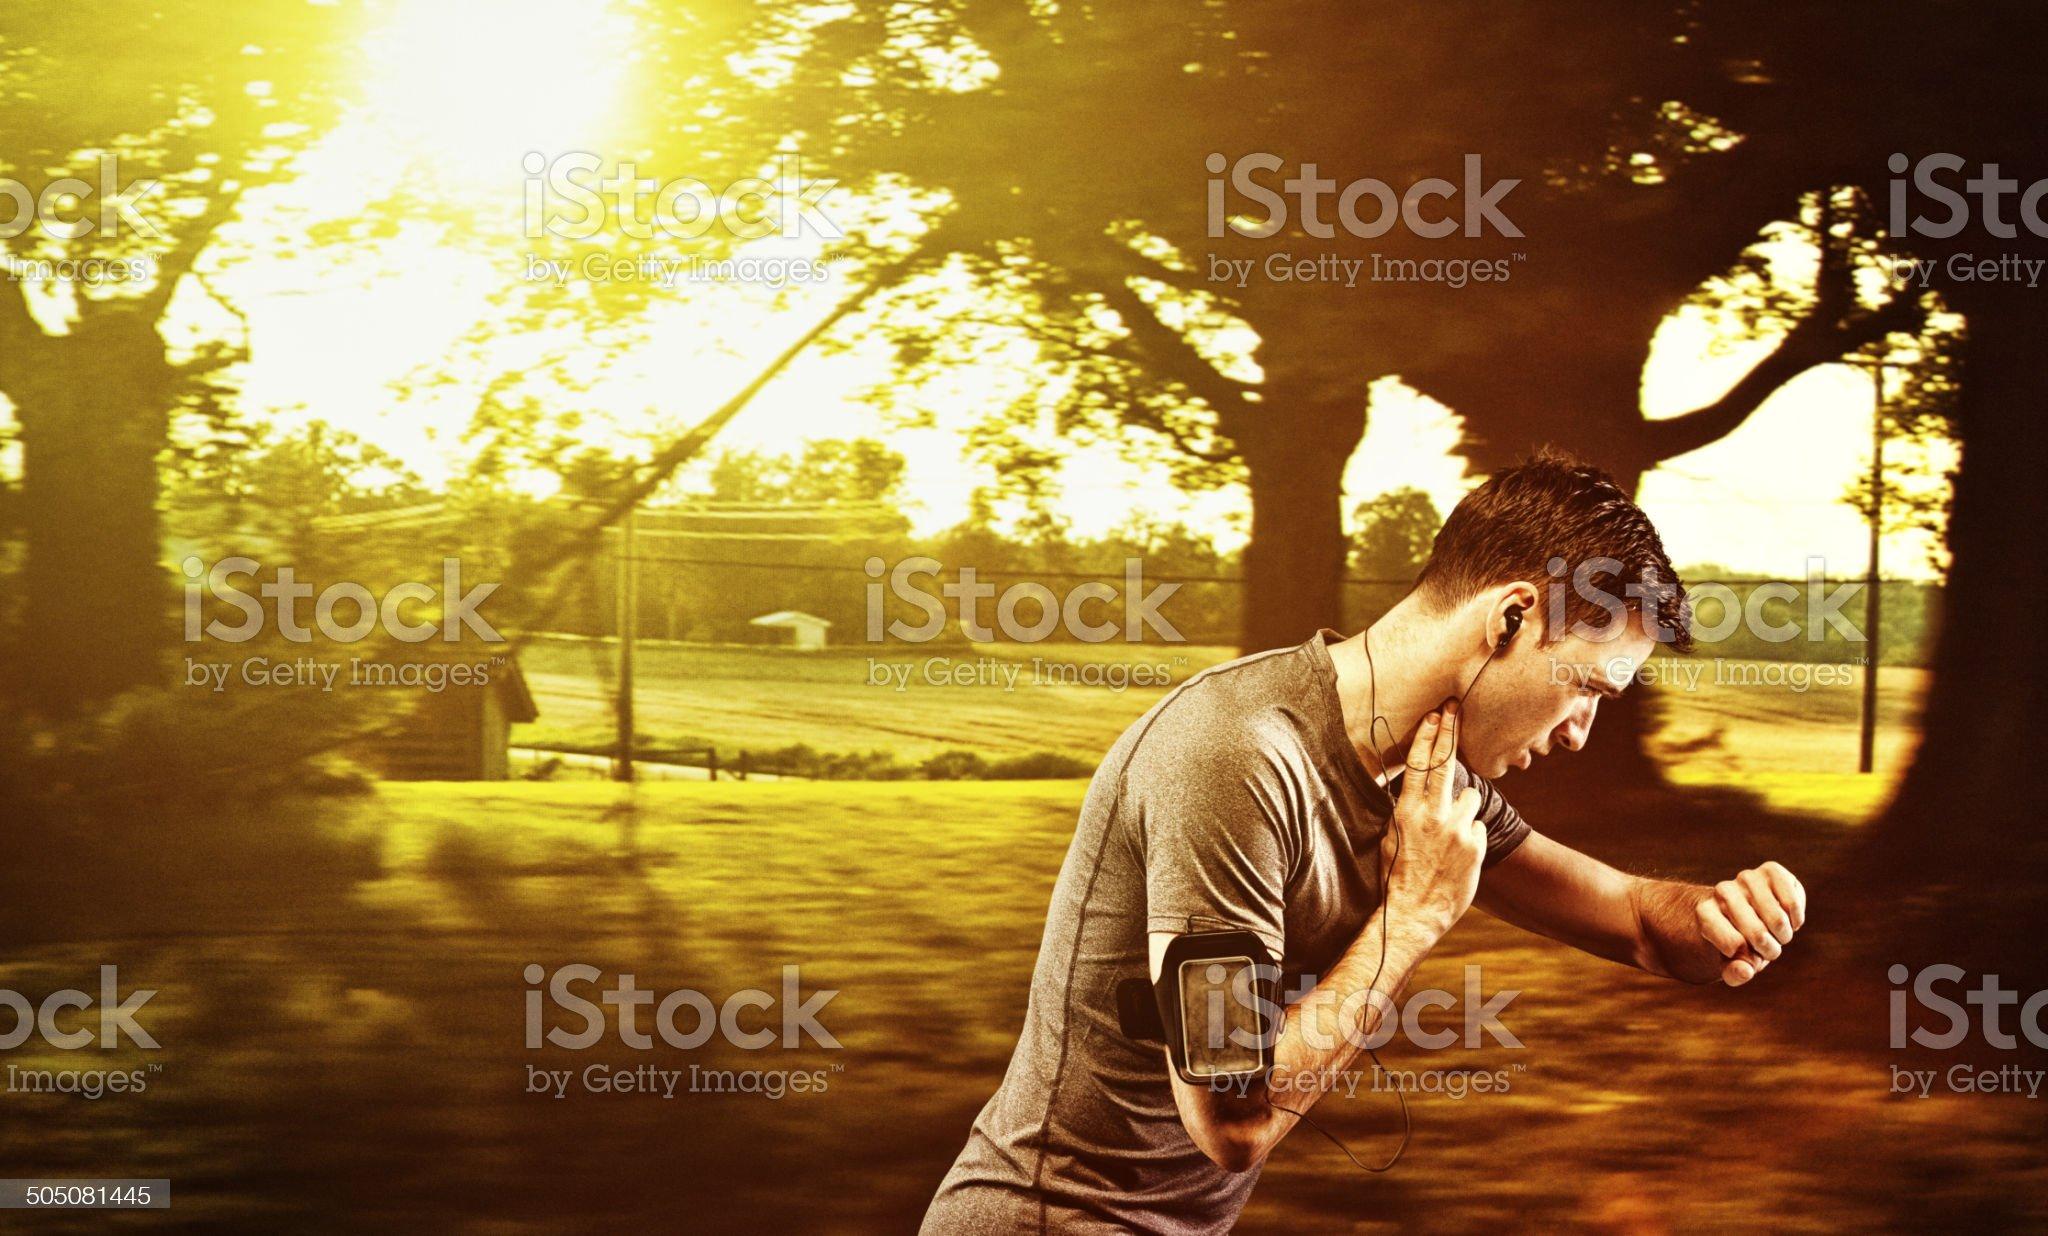 Male runner running in front of rural scene royalty-free stock photo